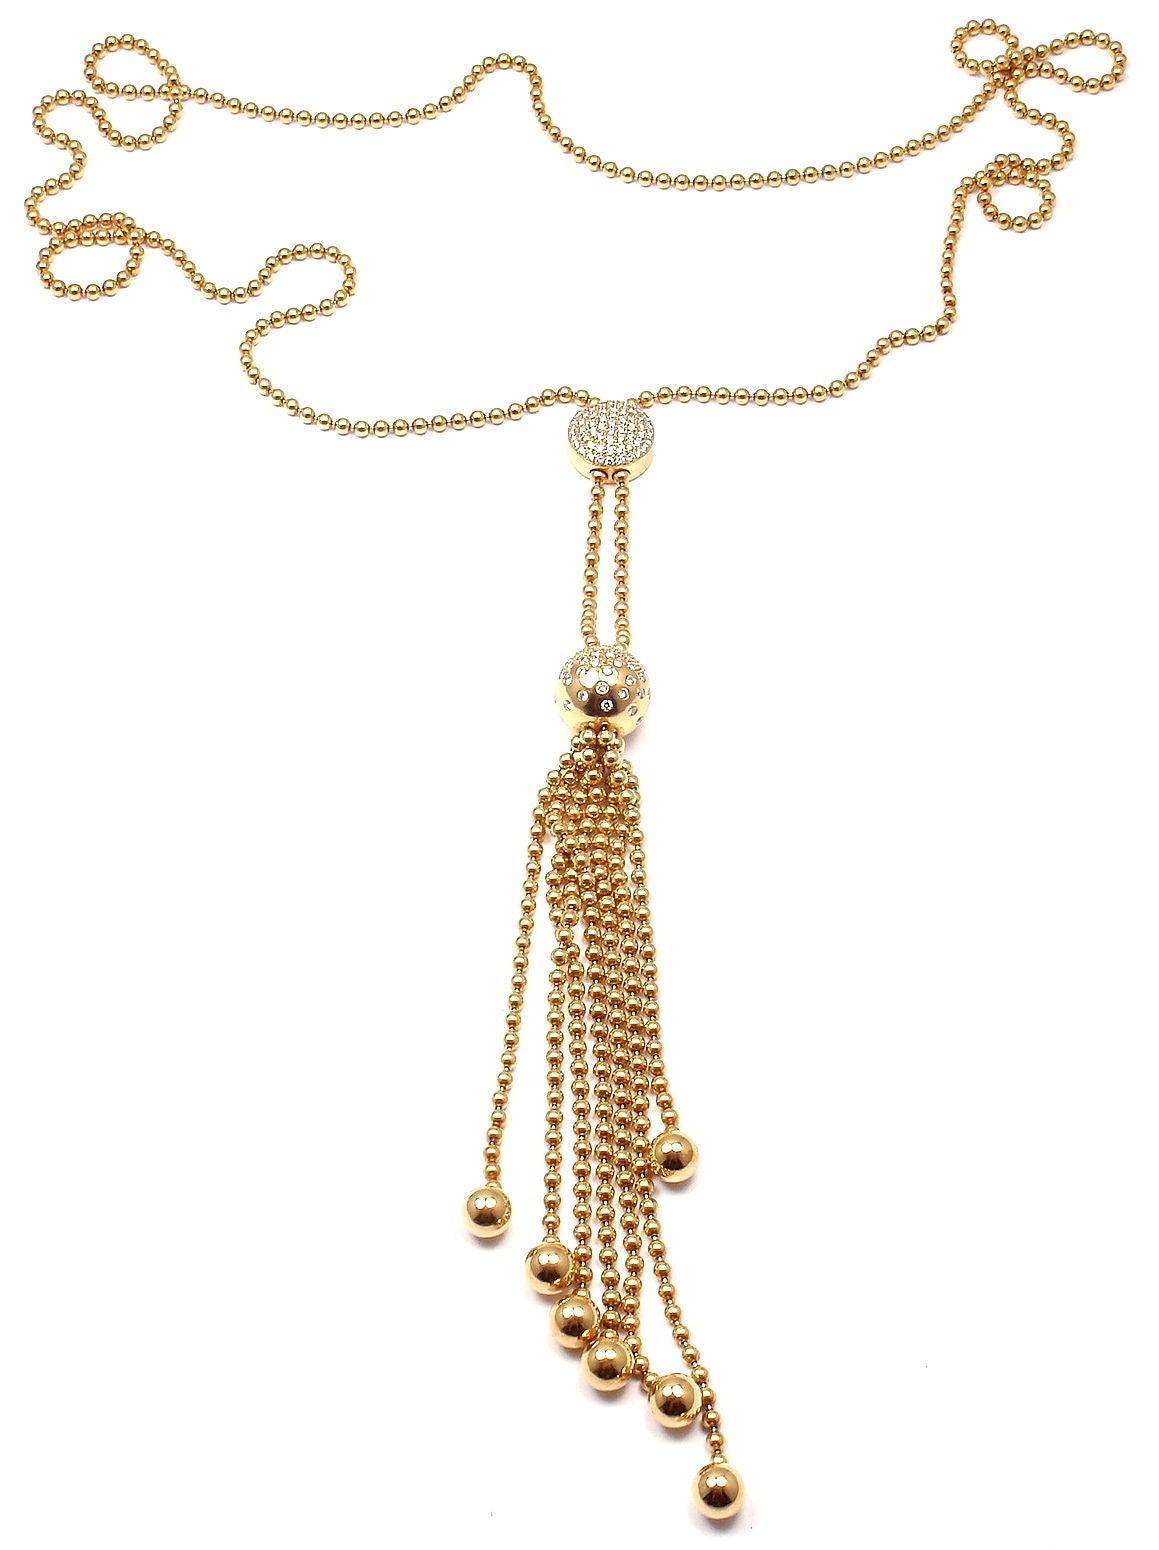 815727d56127b Cartier Draperie Diamond Adjustable Lariat Yellow Gold Necklace